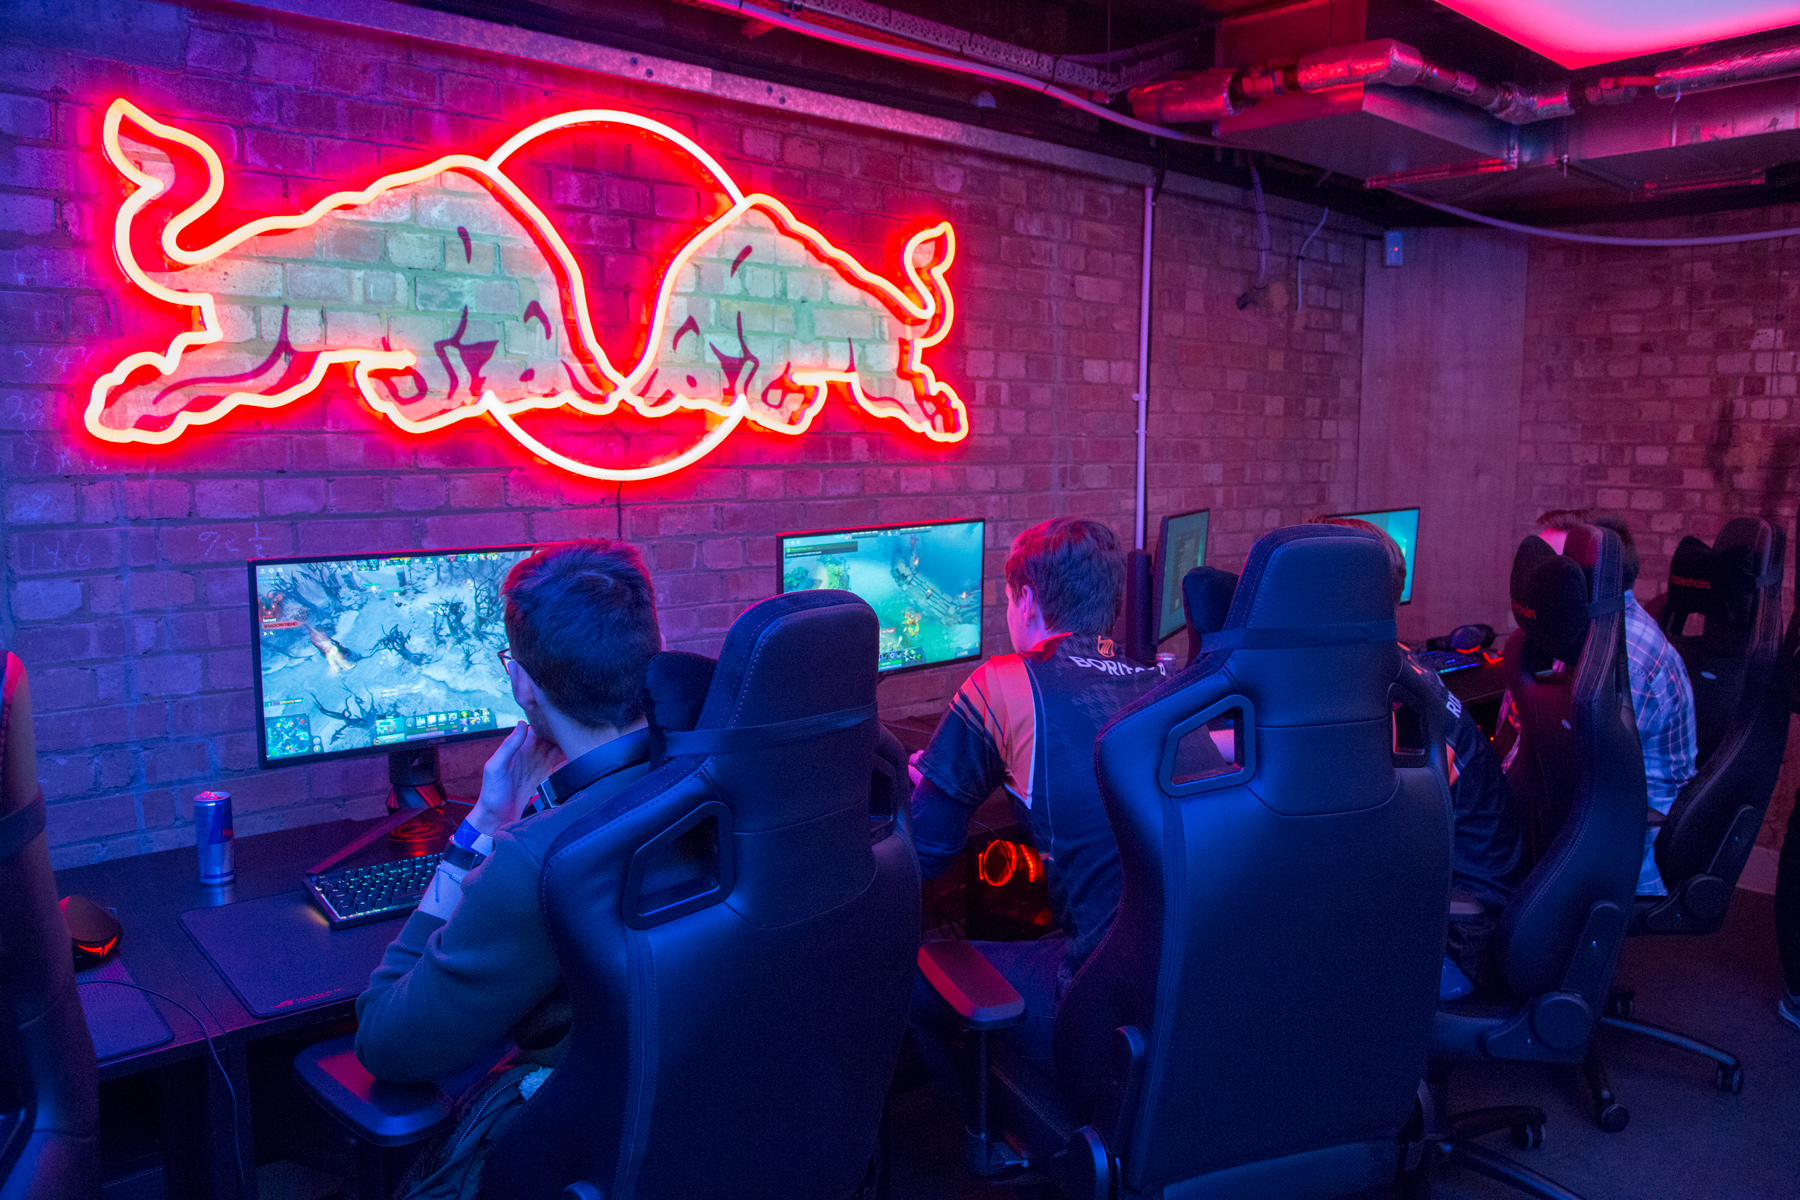 Red Bull built an underground eSports bar in London